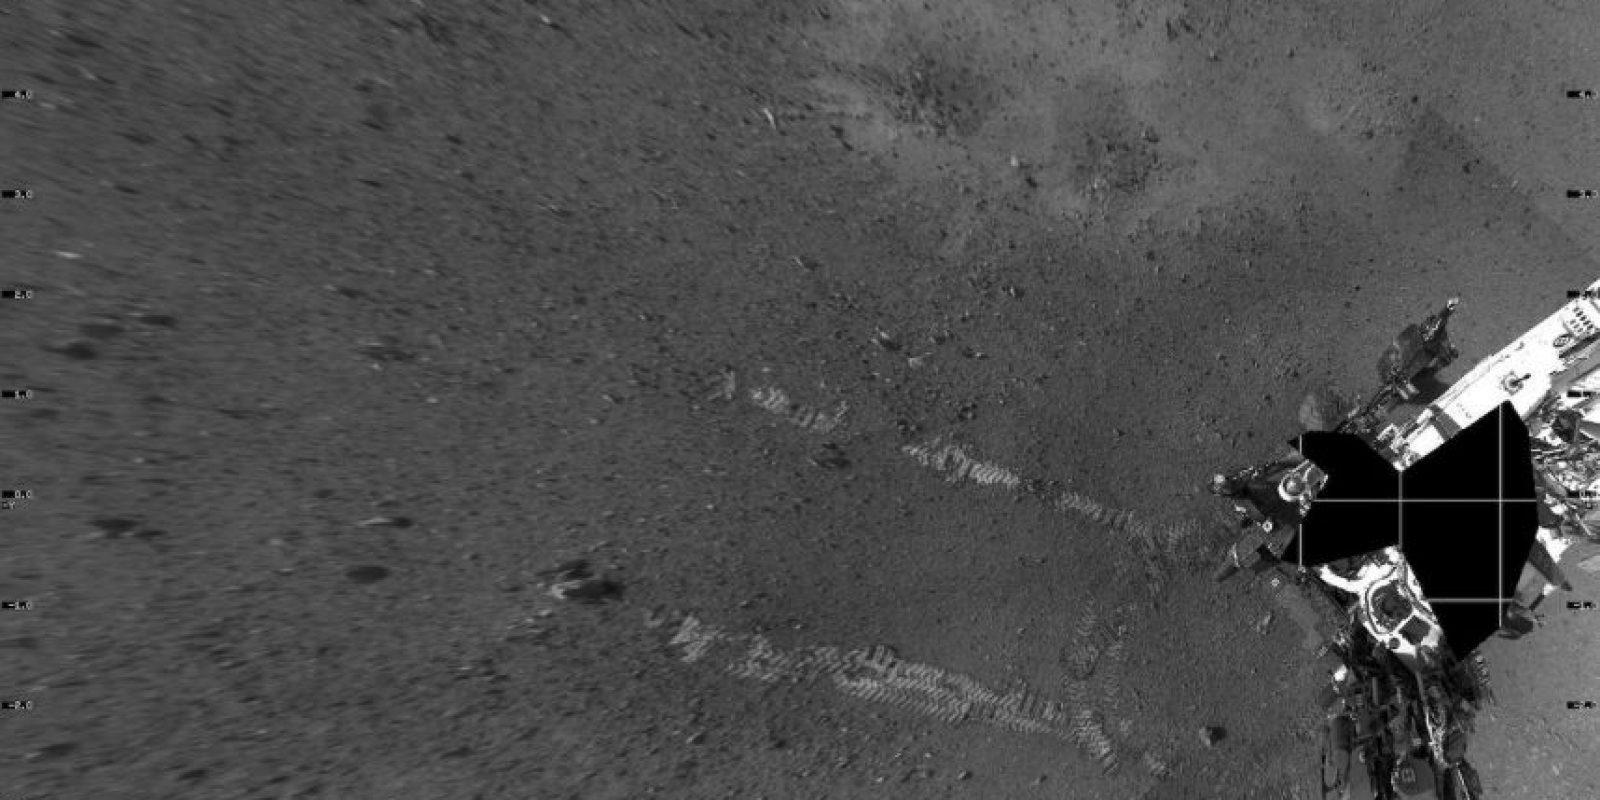 Llegó a Marte el 6 de agosto de 2012 Foto:Getty Images